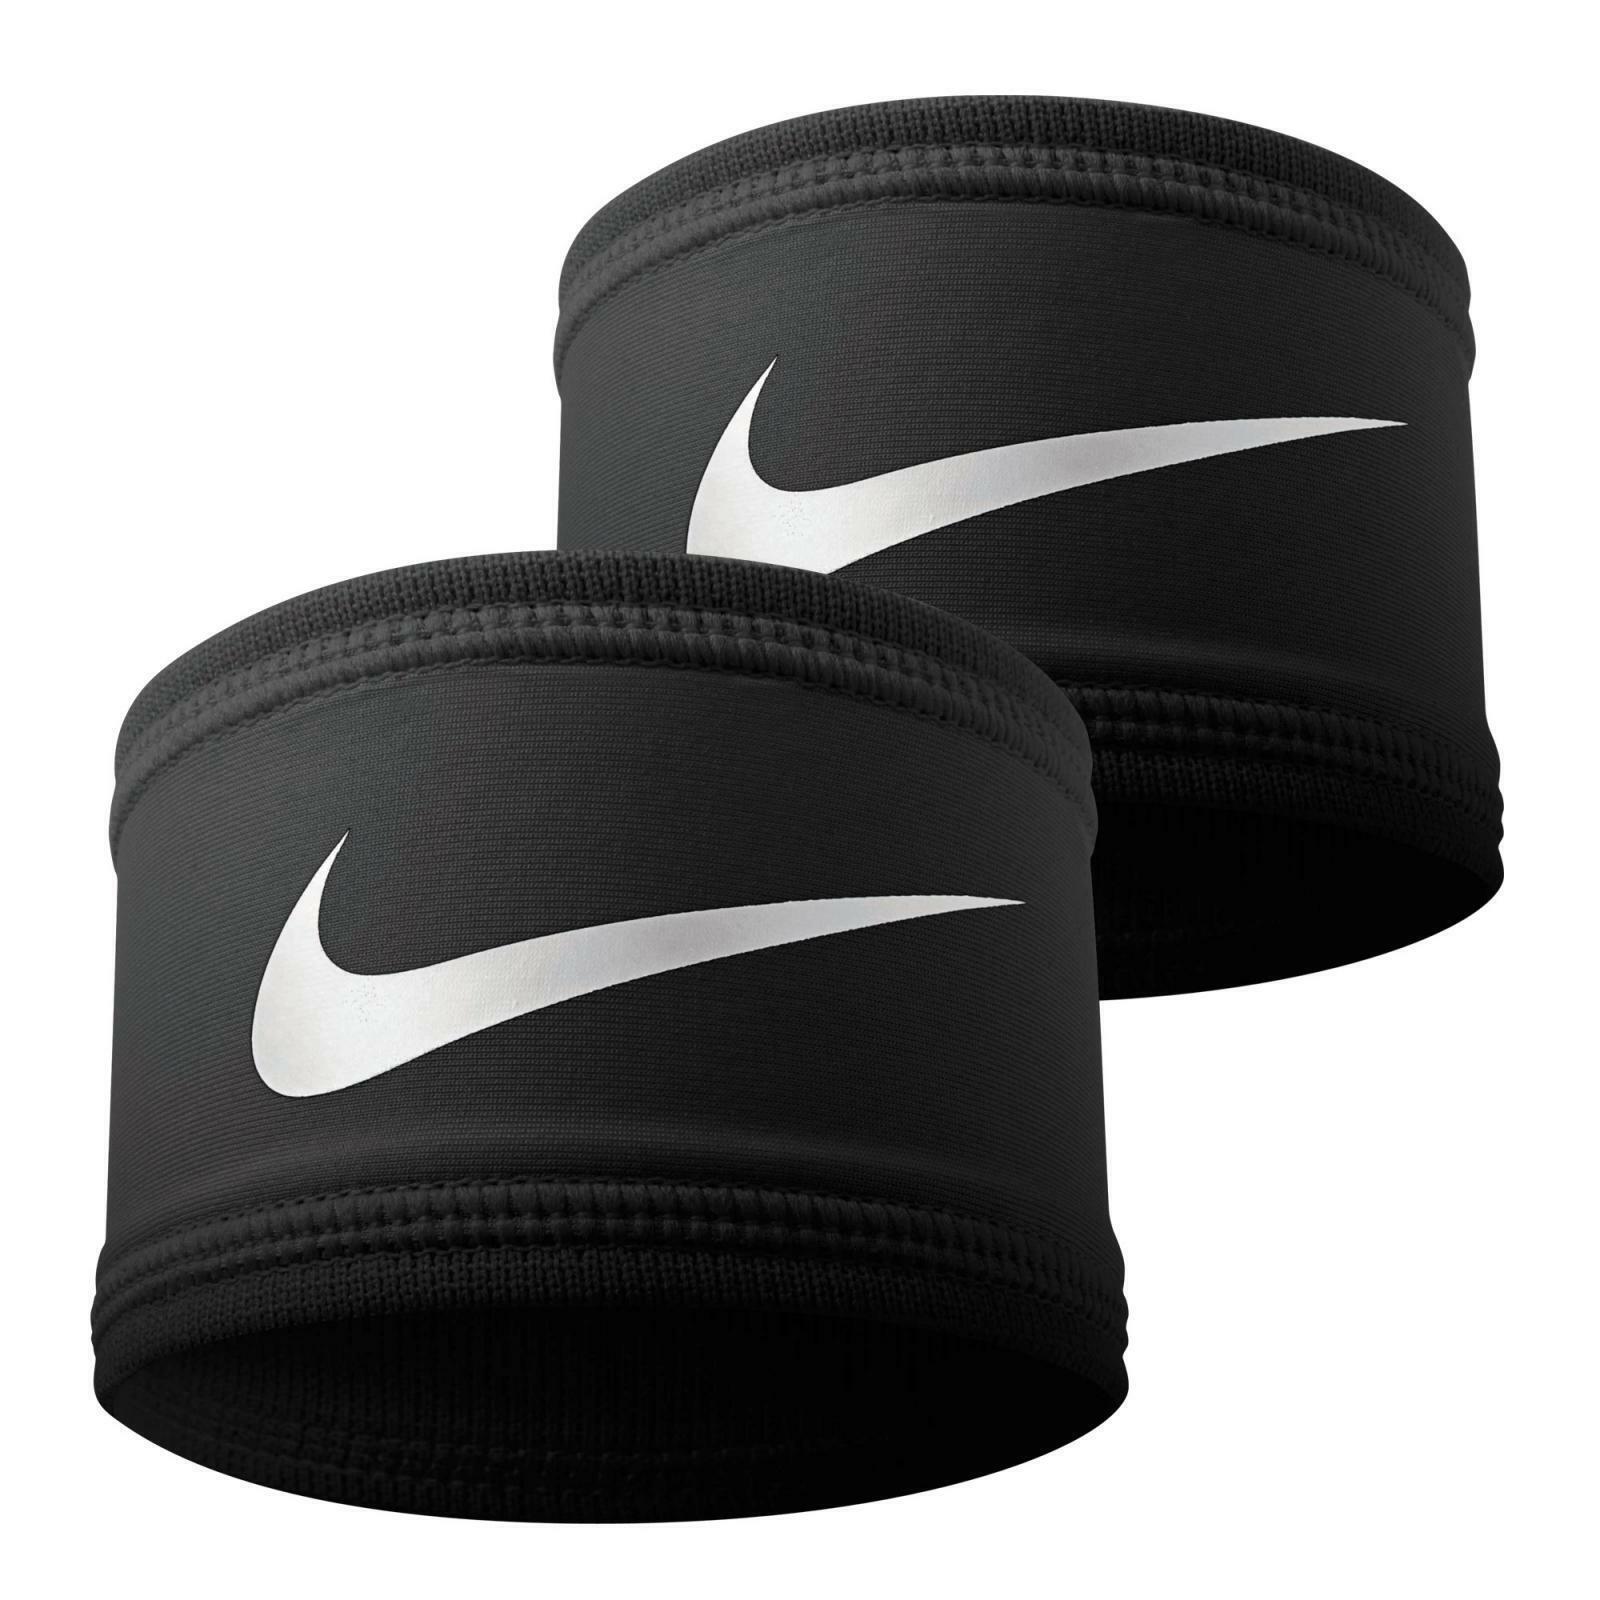 Nike Adults Speed Performance Armband Lightweight nnn23010os RRP (AS28)